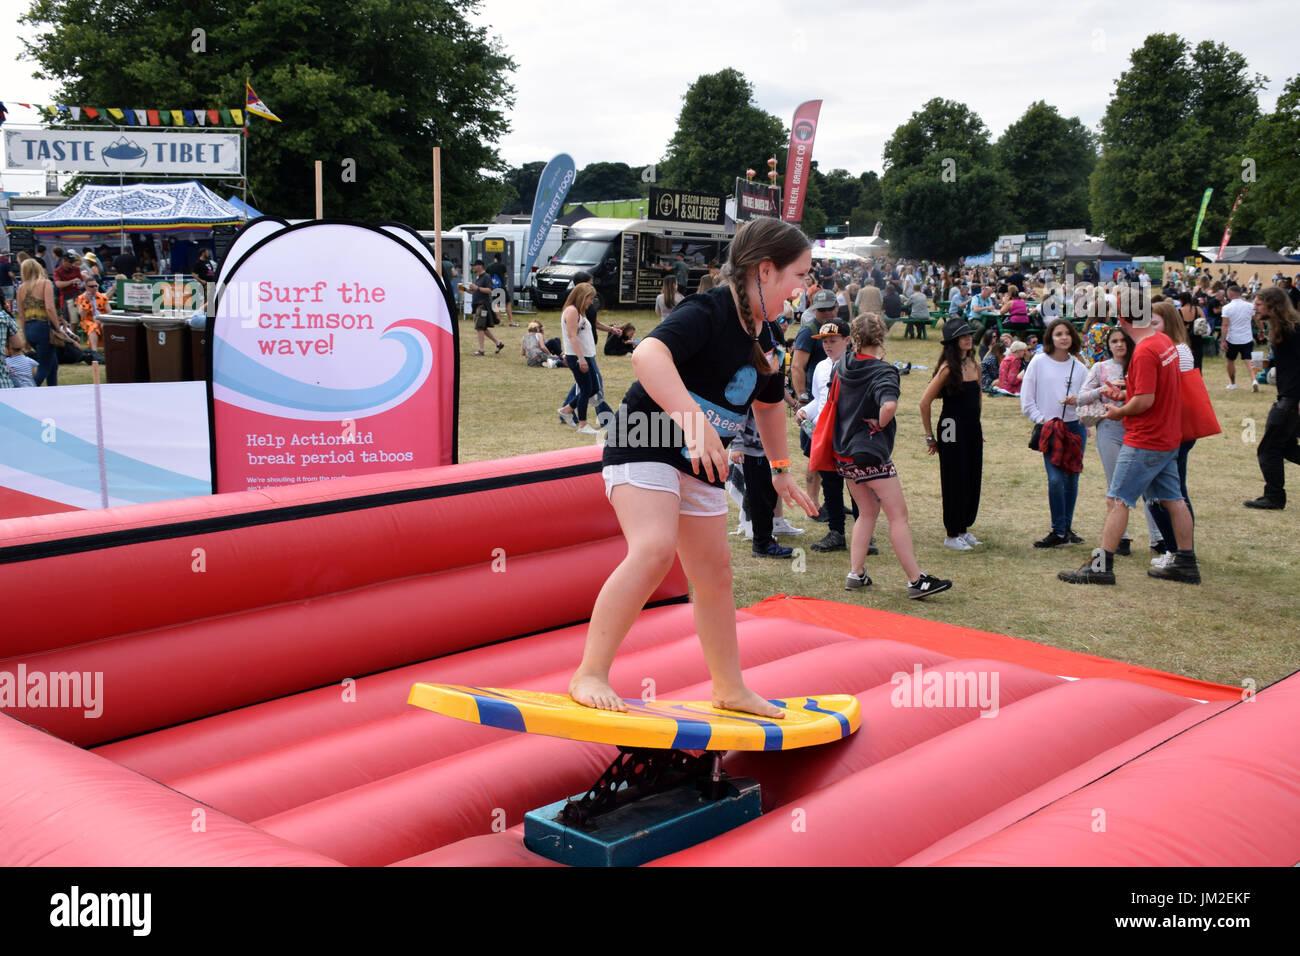 Latitude Festival 2017, Henham Park, Suffolk, UK. ActionAid surf simulator. ActionAid works with the poorest women & girls internationally changing th - Stock Image